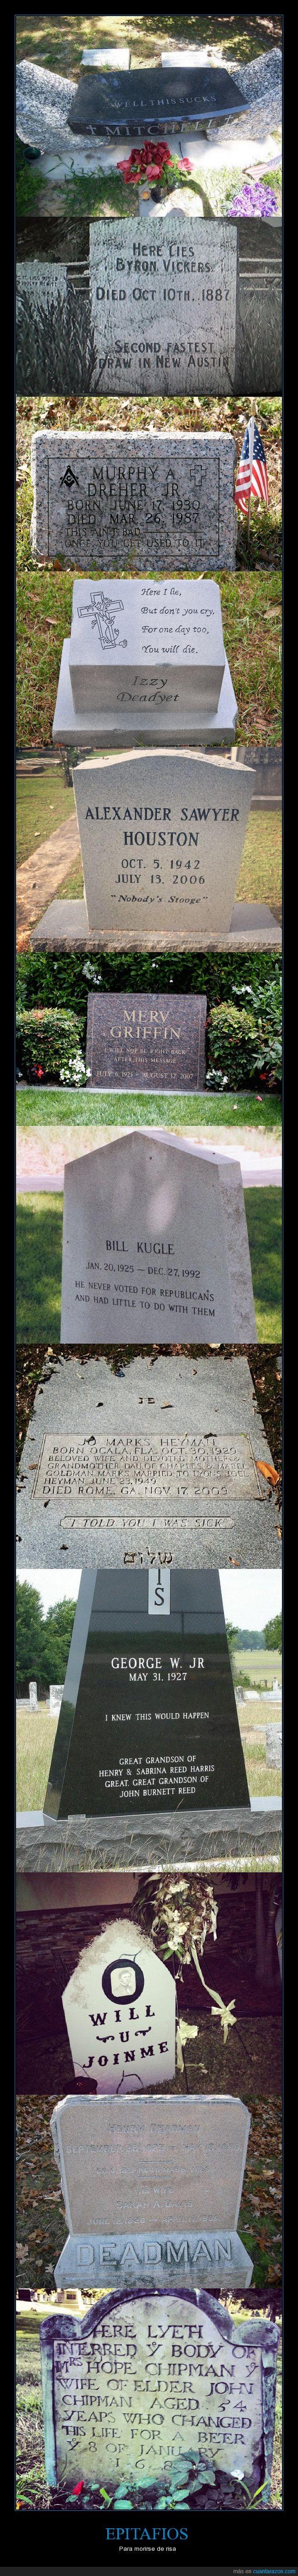 cementerio,epitafios,inglés,morir,muerte,risa,tumba